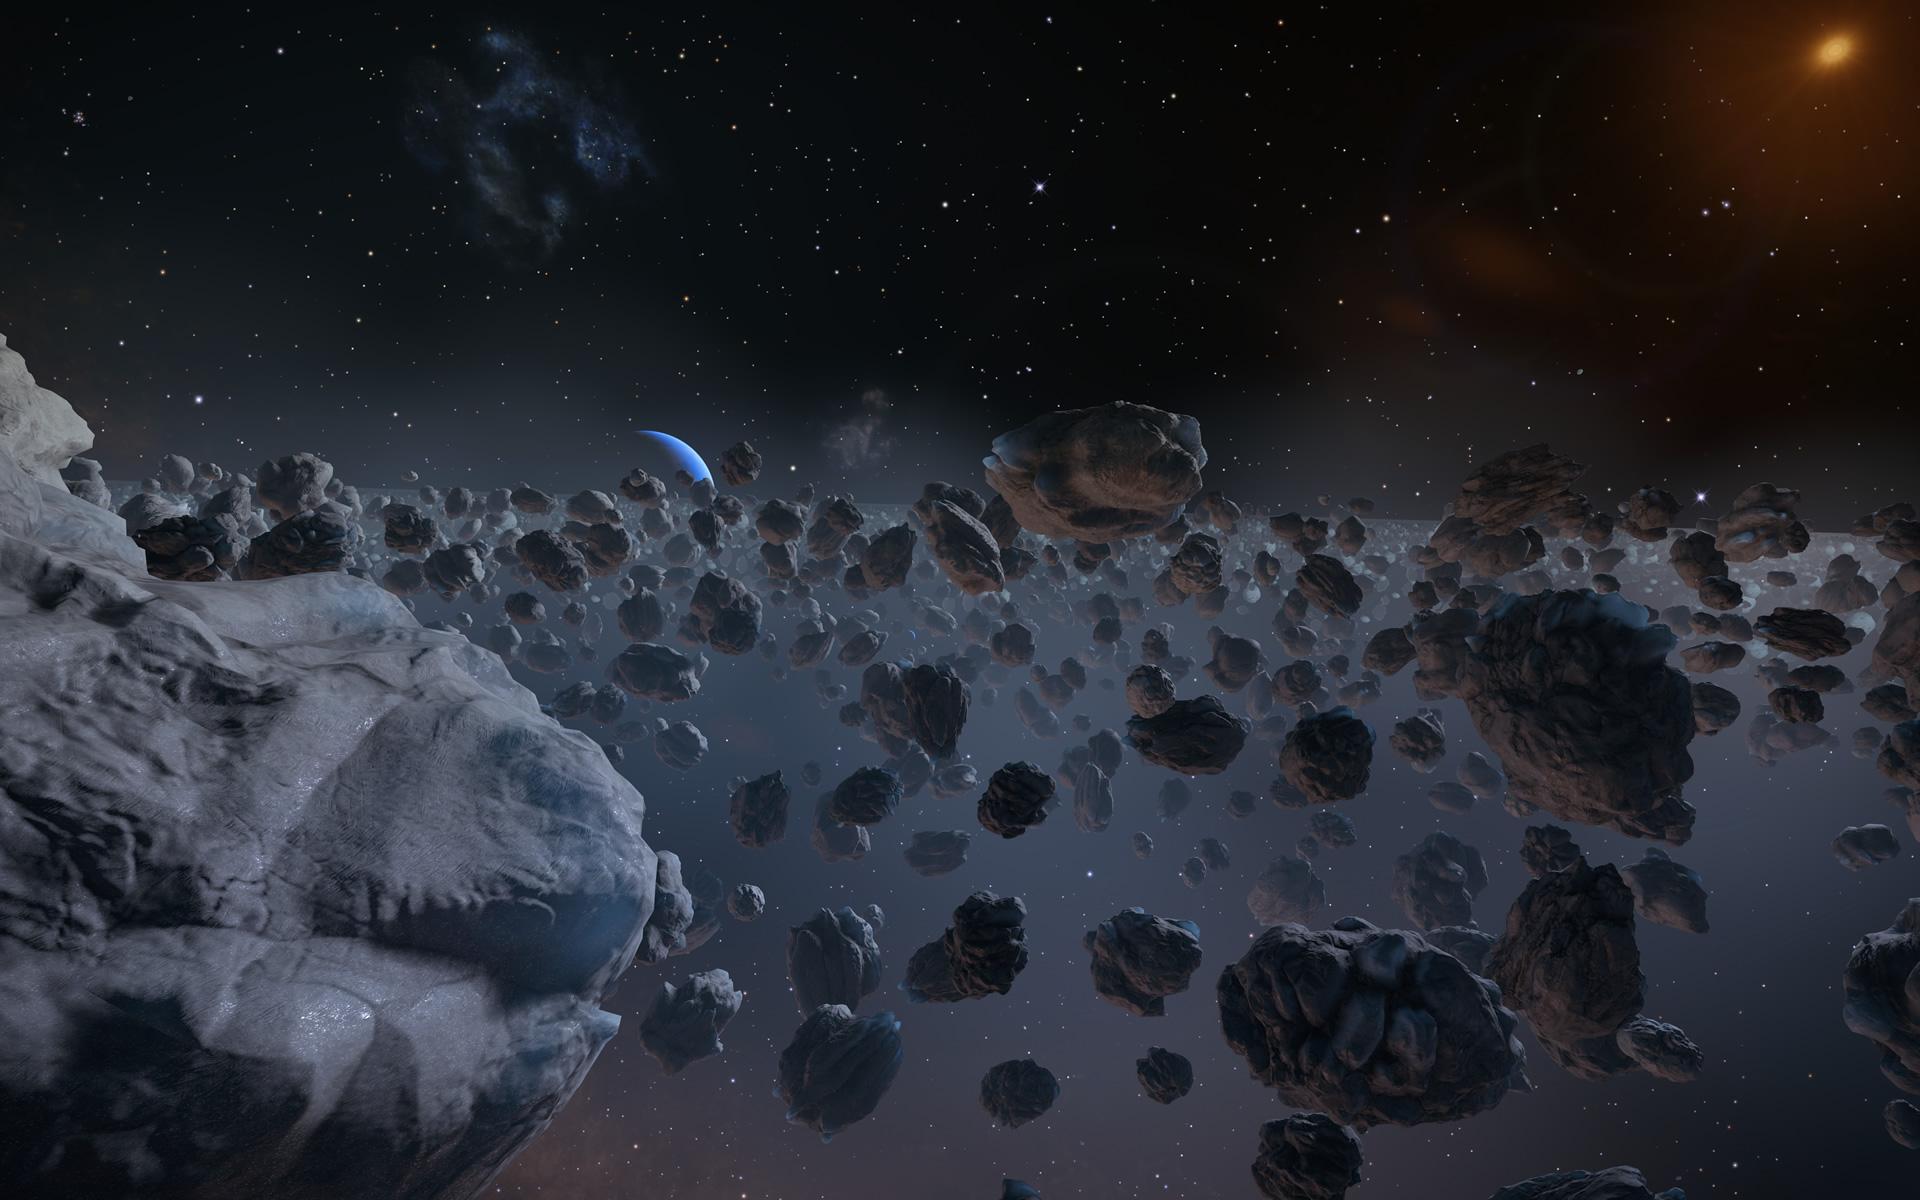 ice comet asteroids - photo #1